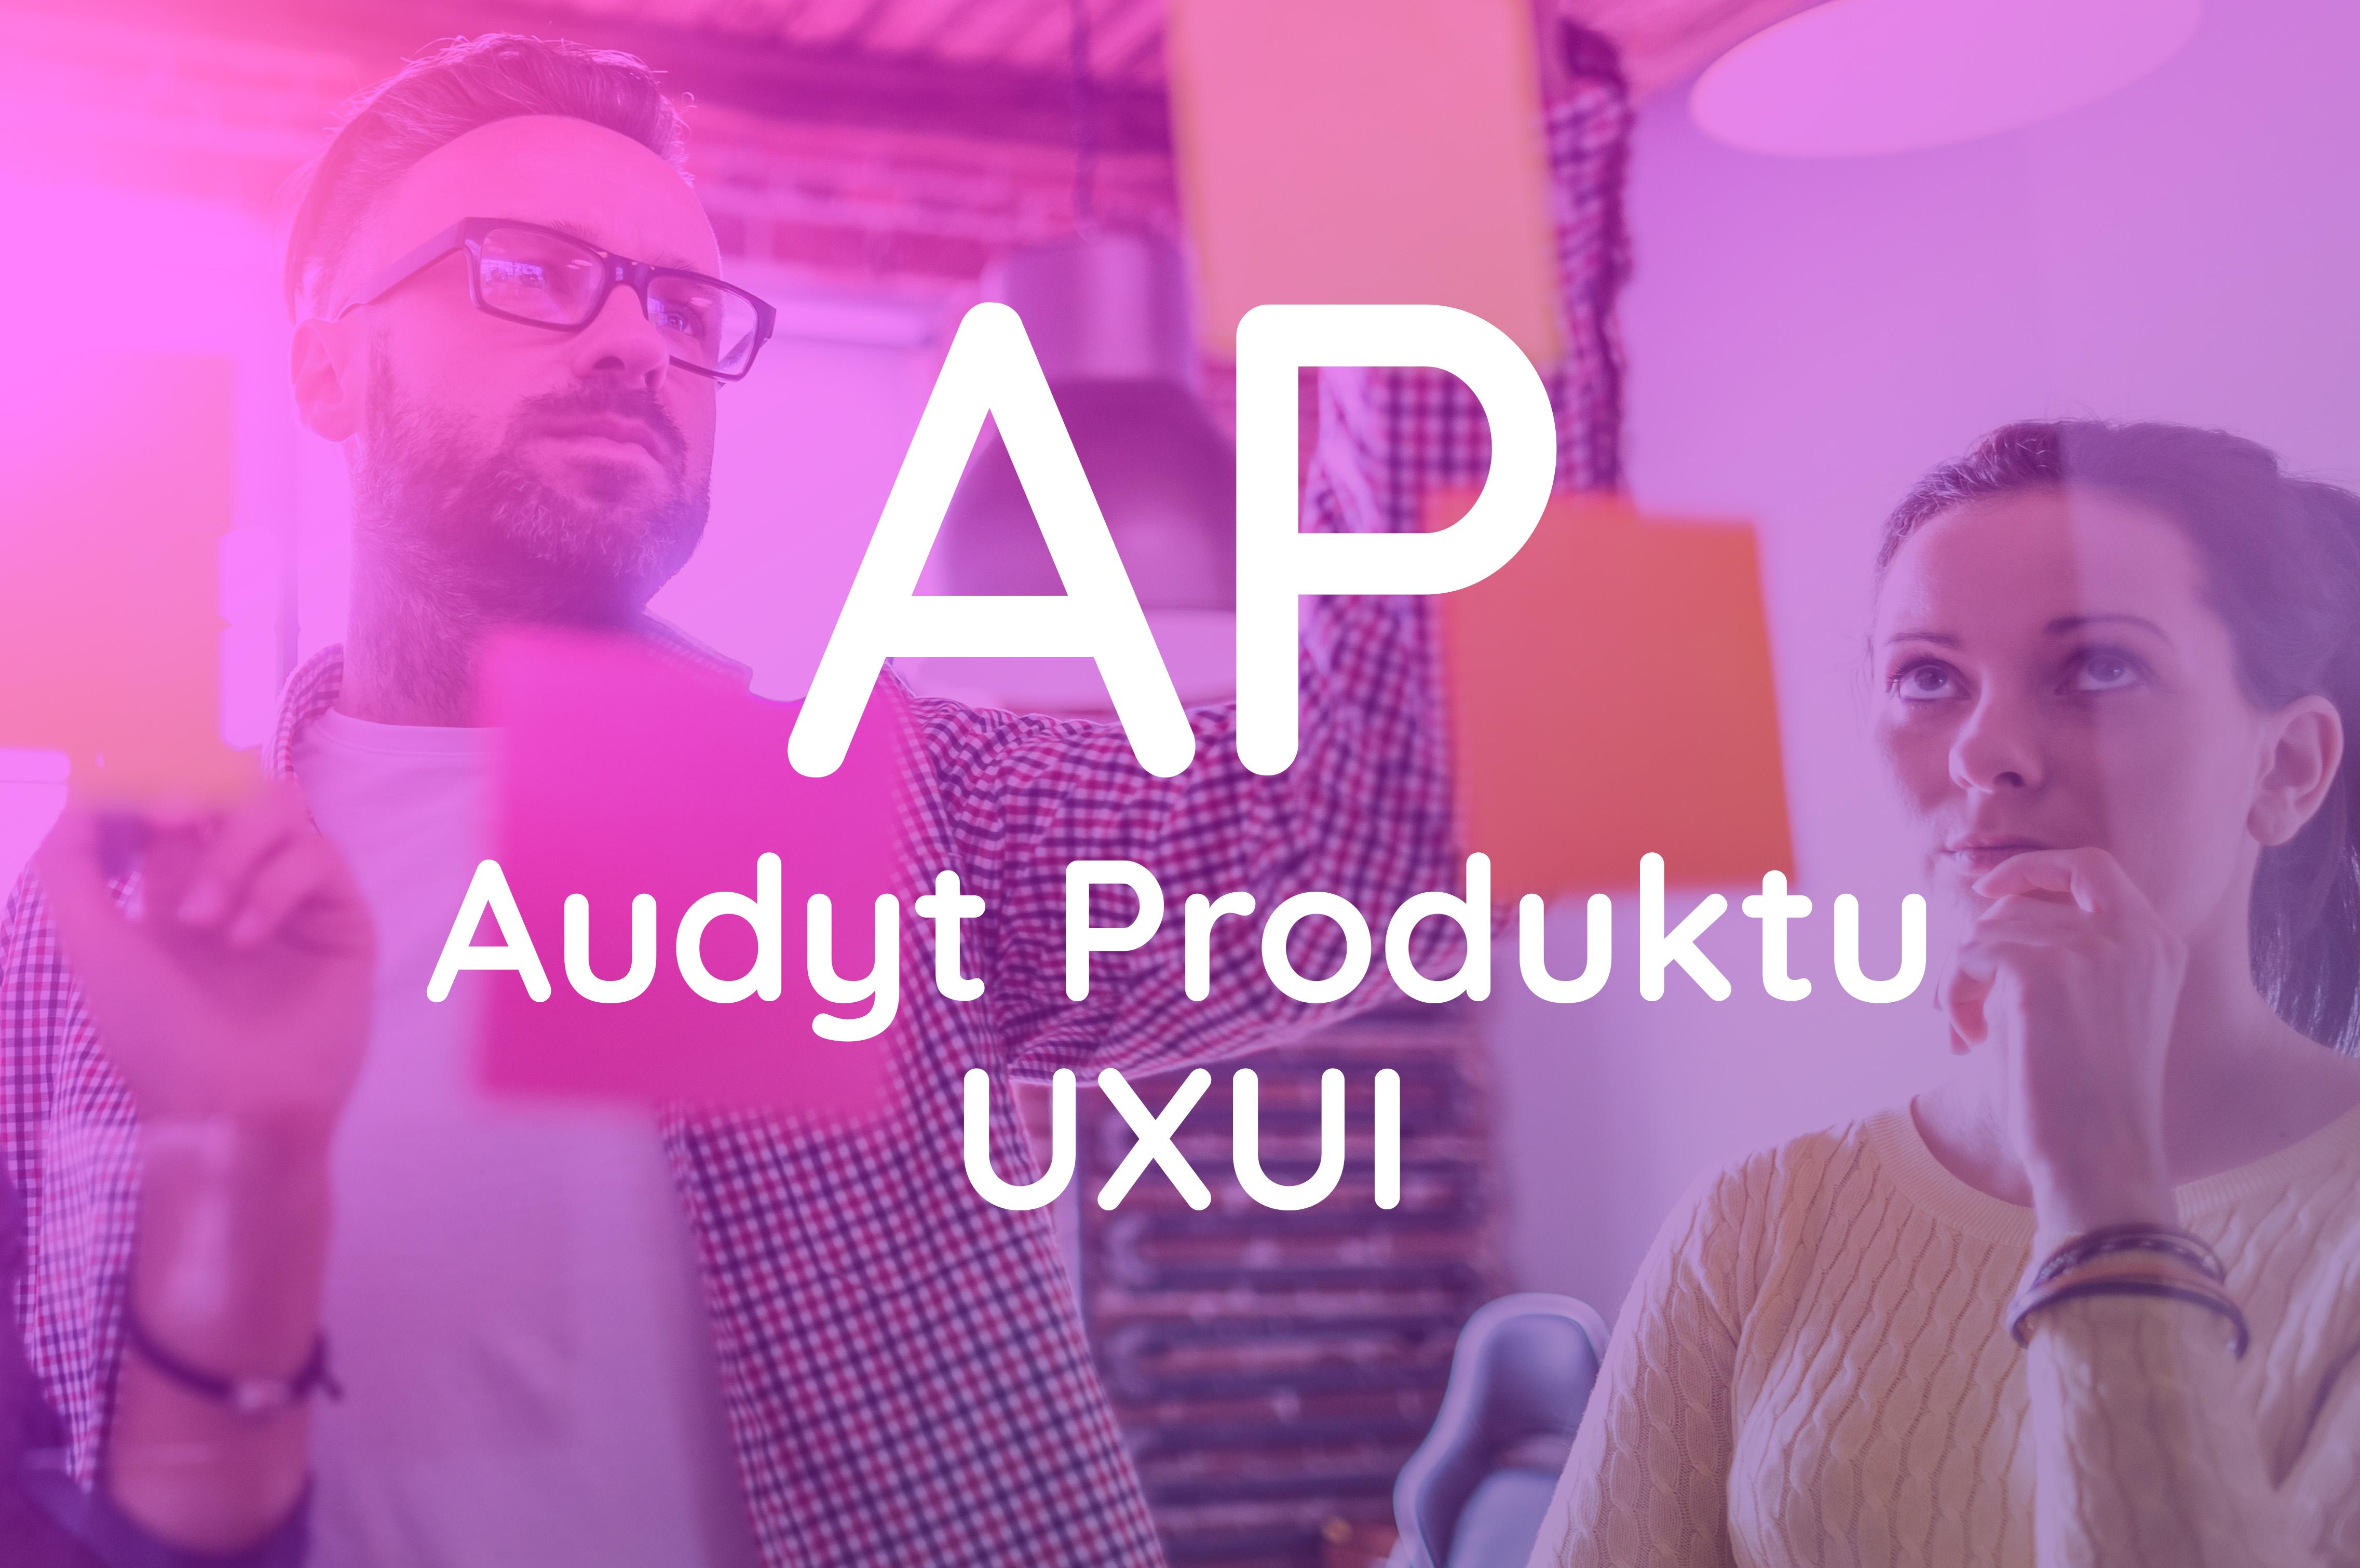 Audyt Produktu UXUI